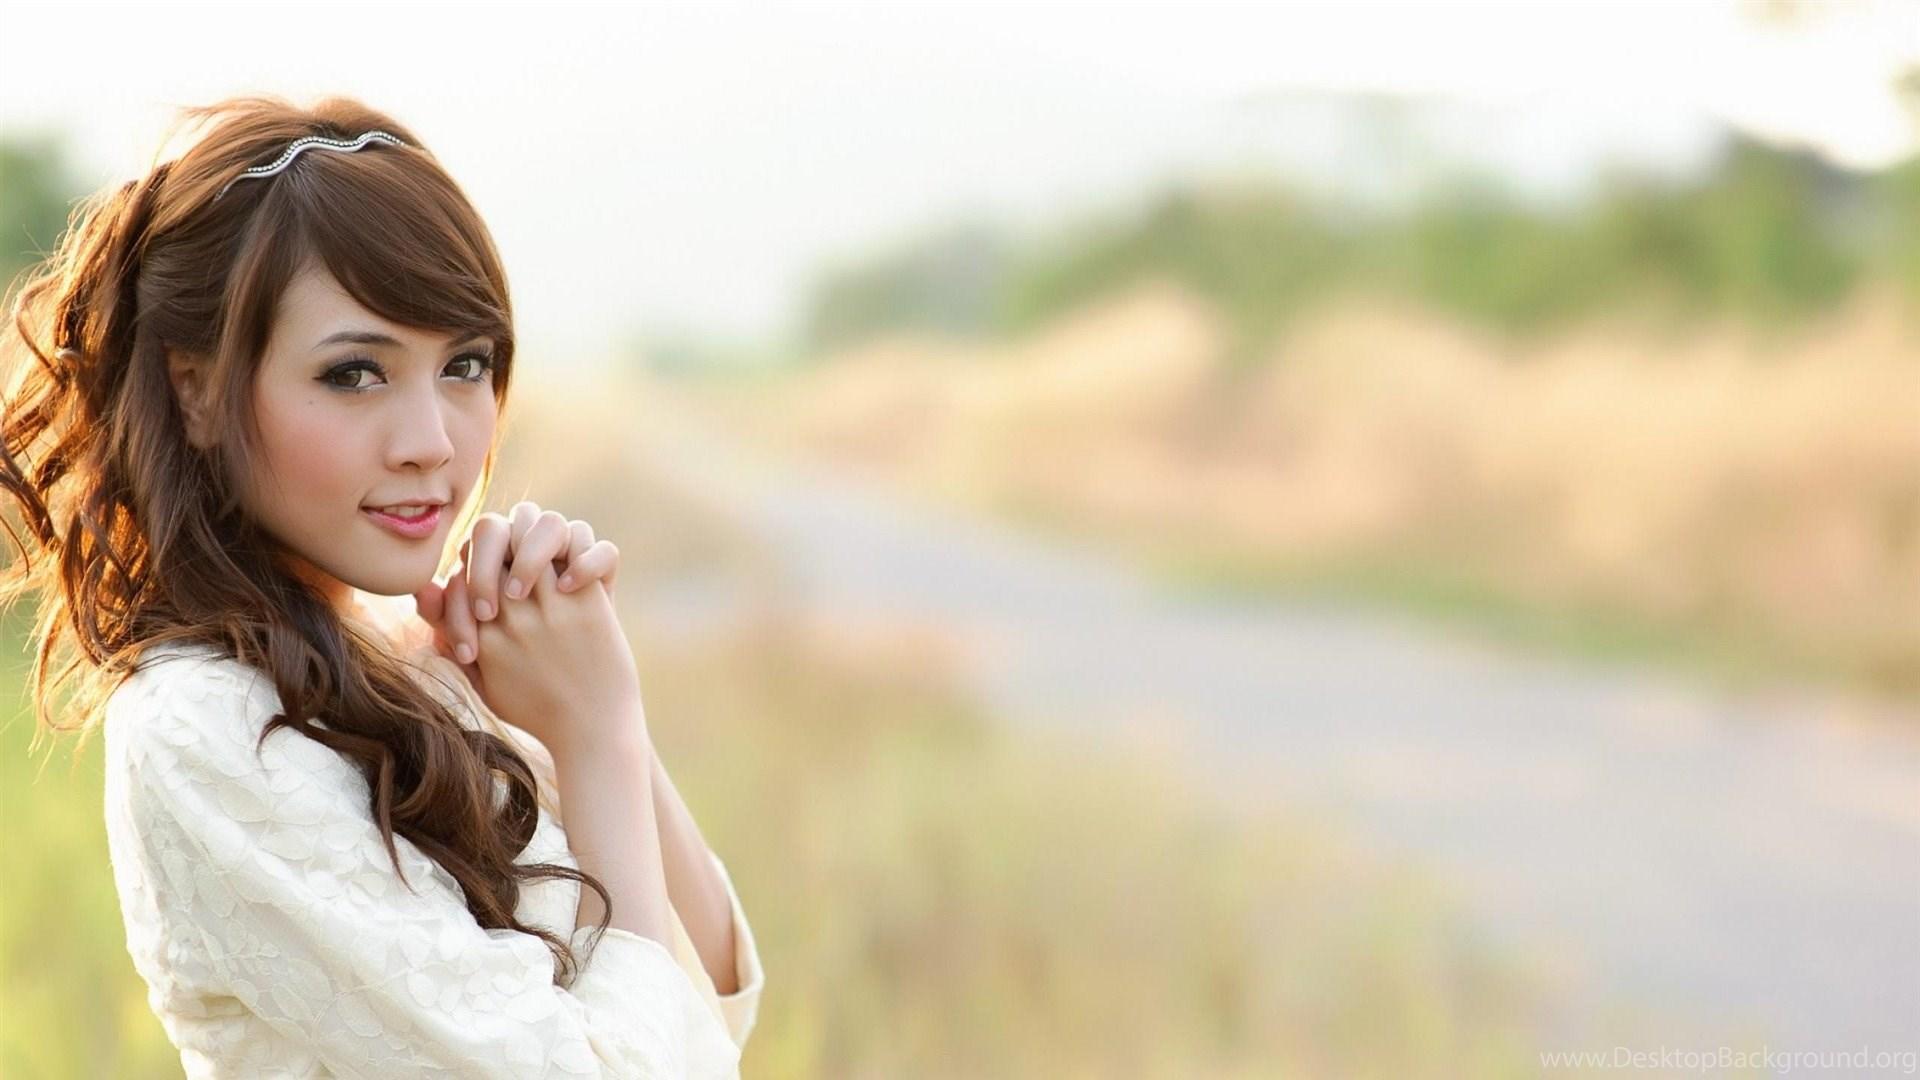 Hd korean girl wallpapers wallpapers asian girl wallpapers full hd archives 7hdwallpapers voltagebd Images